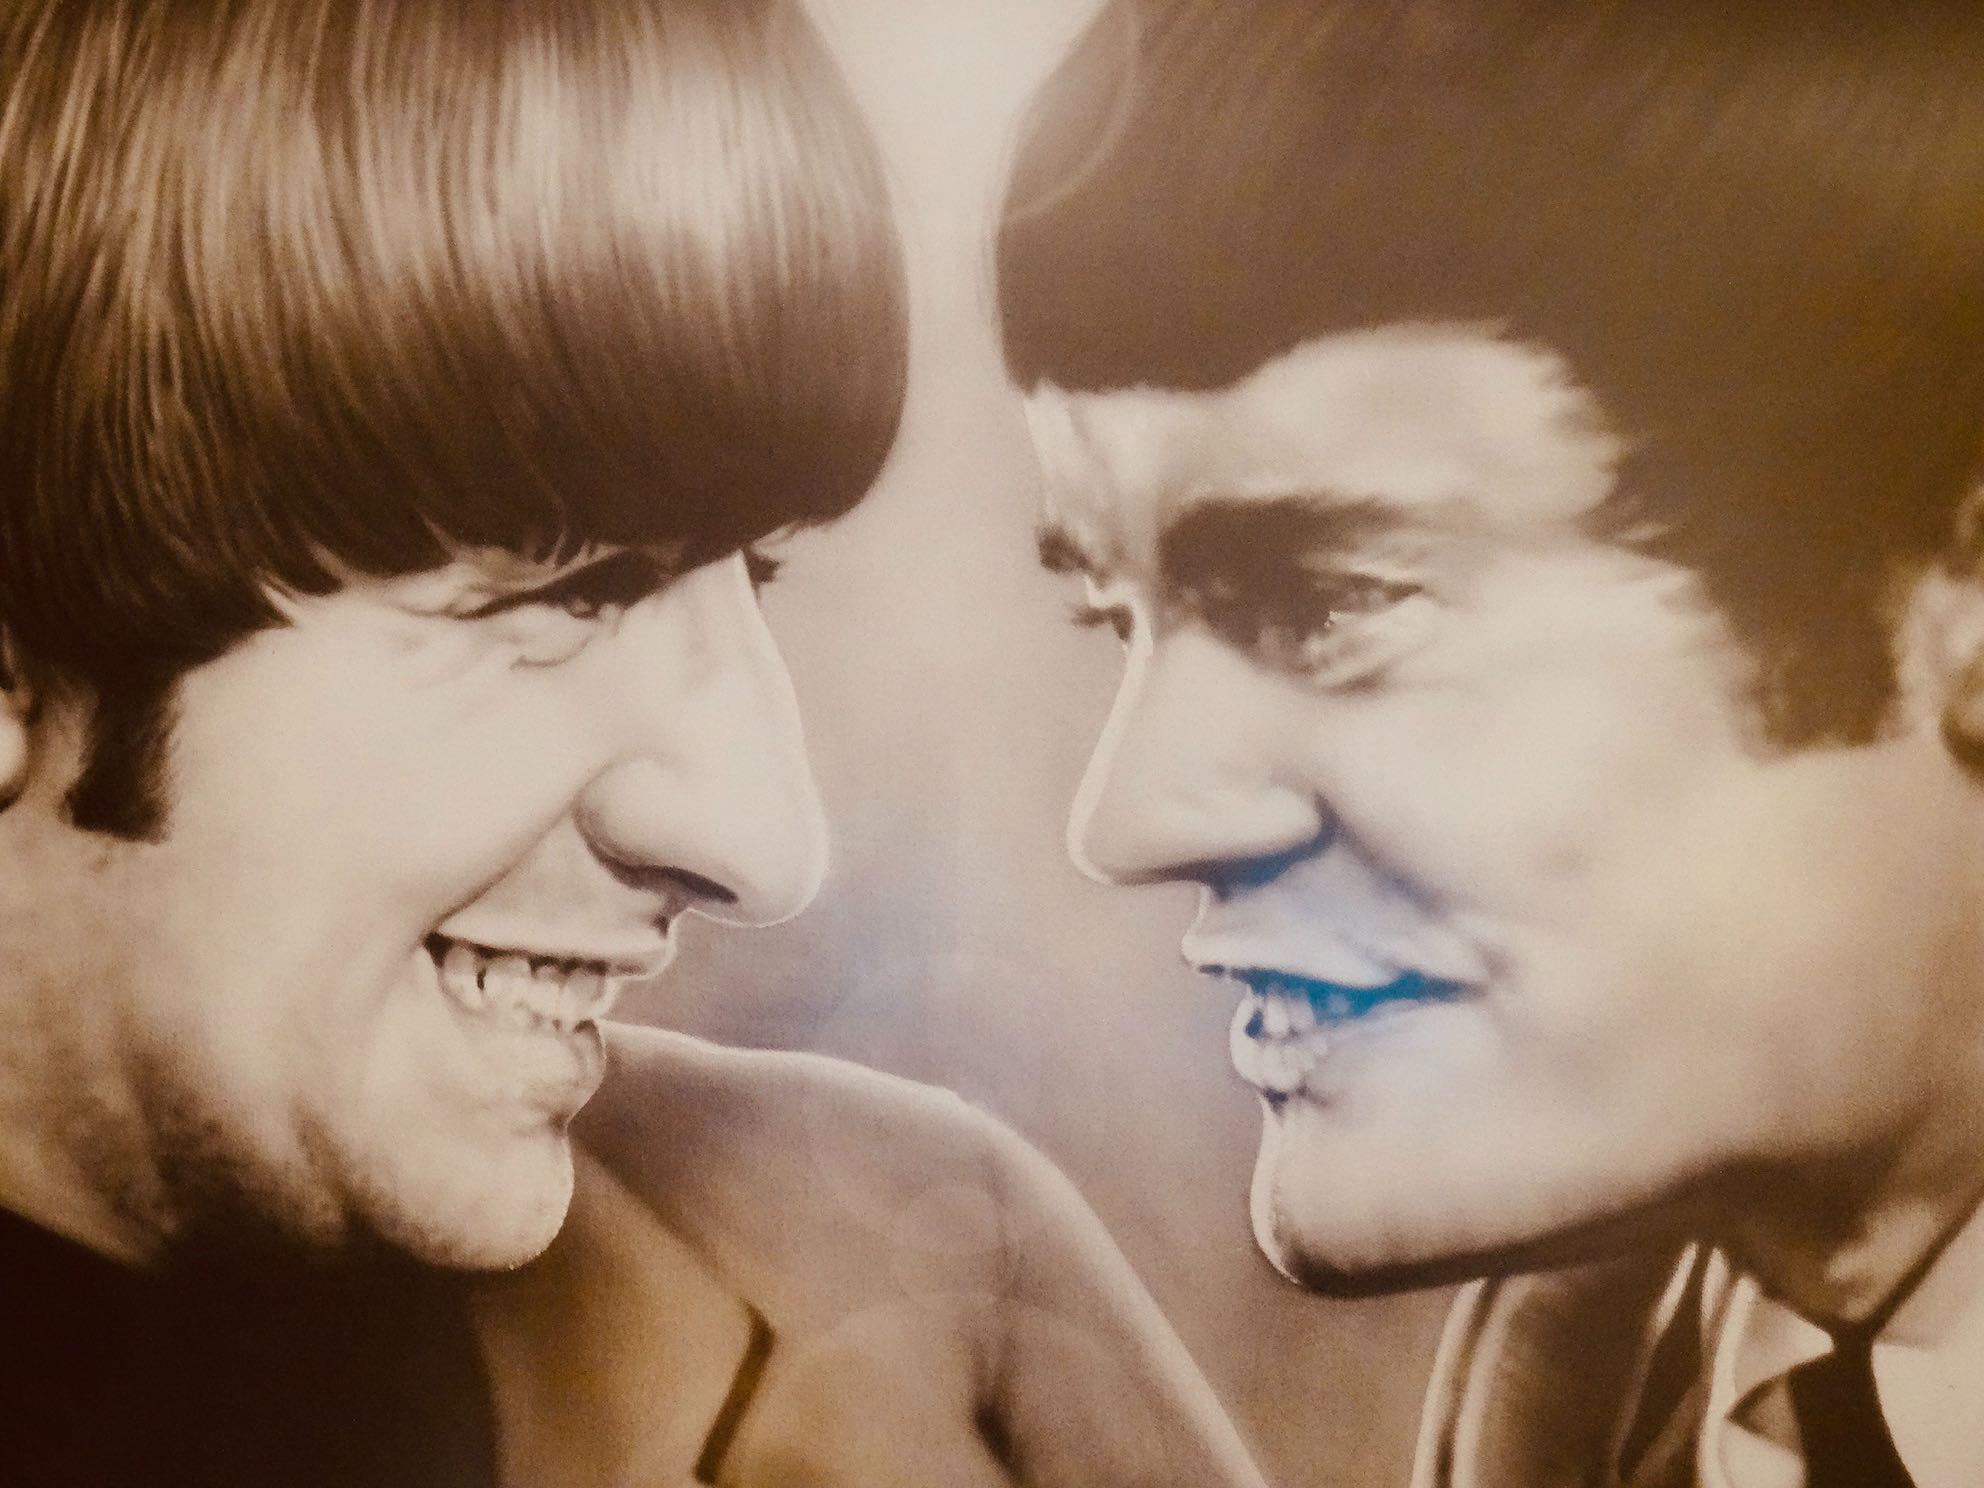 Ringo Starr and Jimmy Nicol.